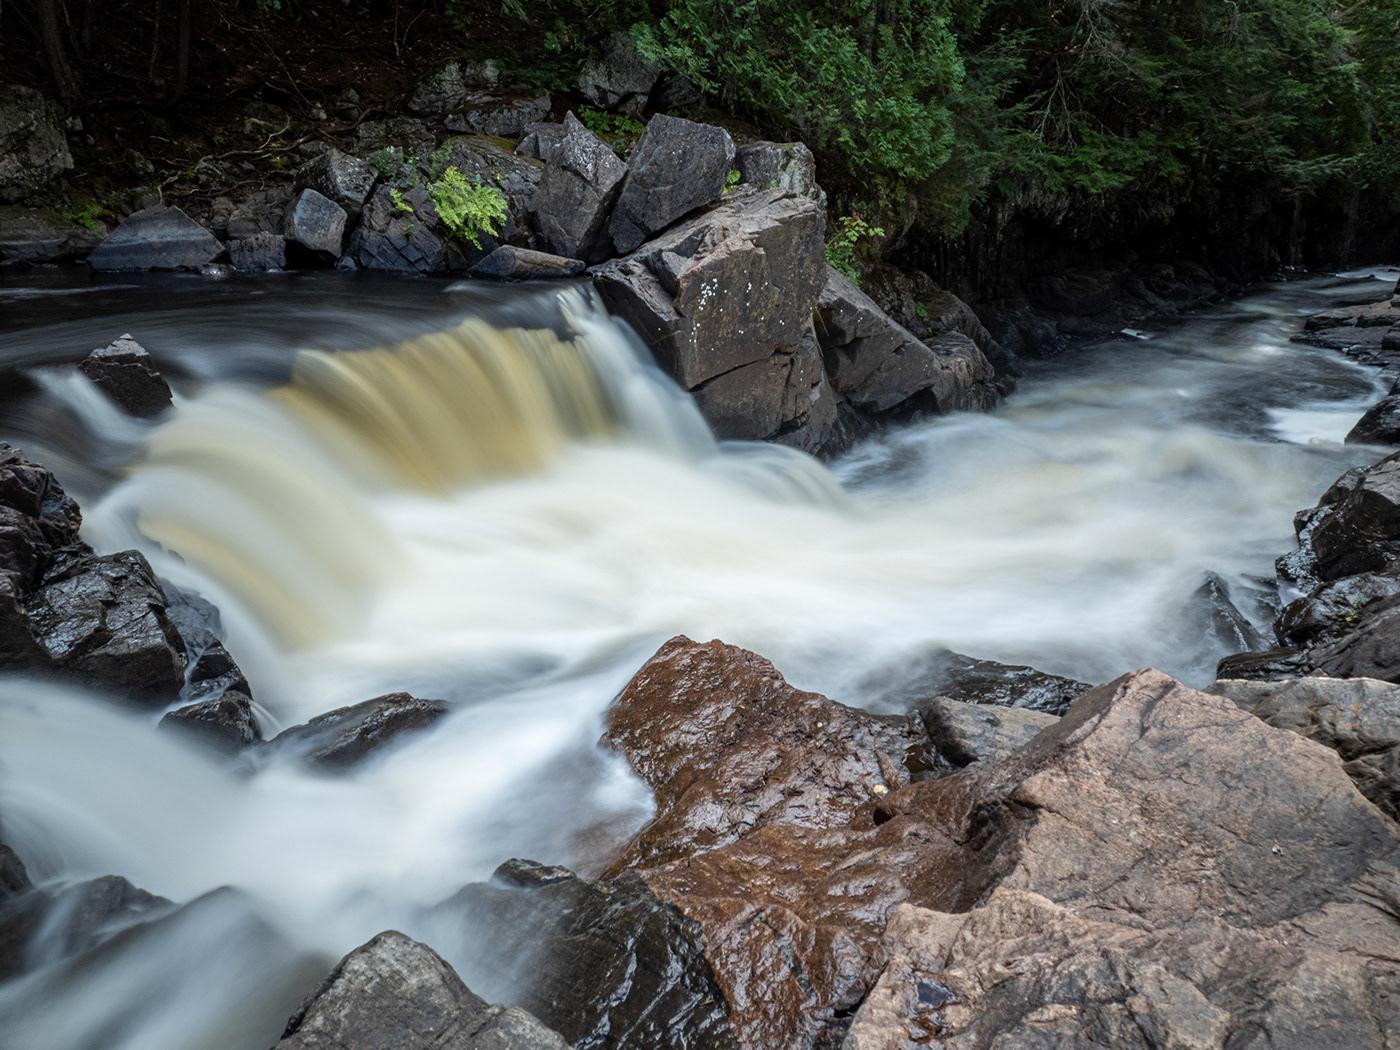 Gorge Kawarthas Landscape rocks The Gut Conservation area waterfall